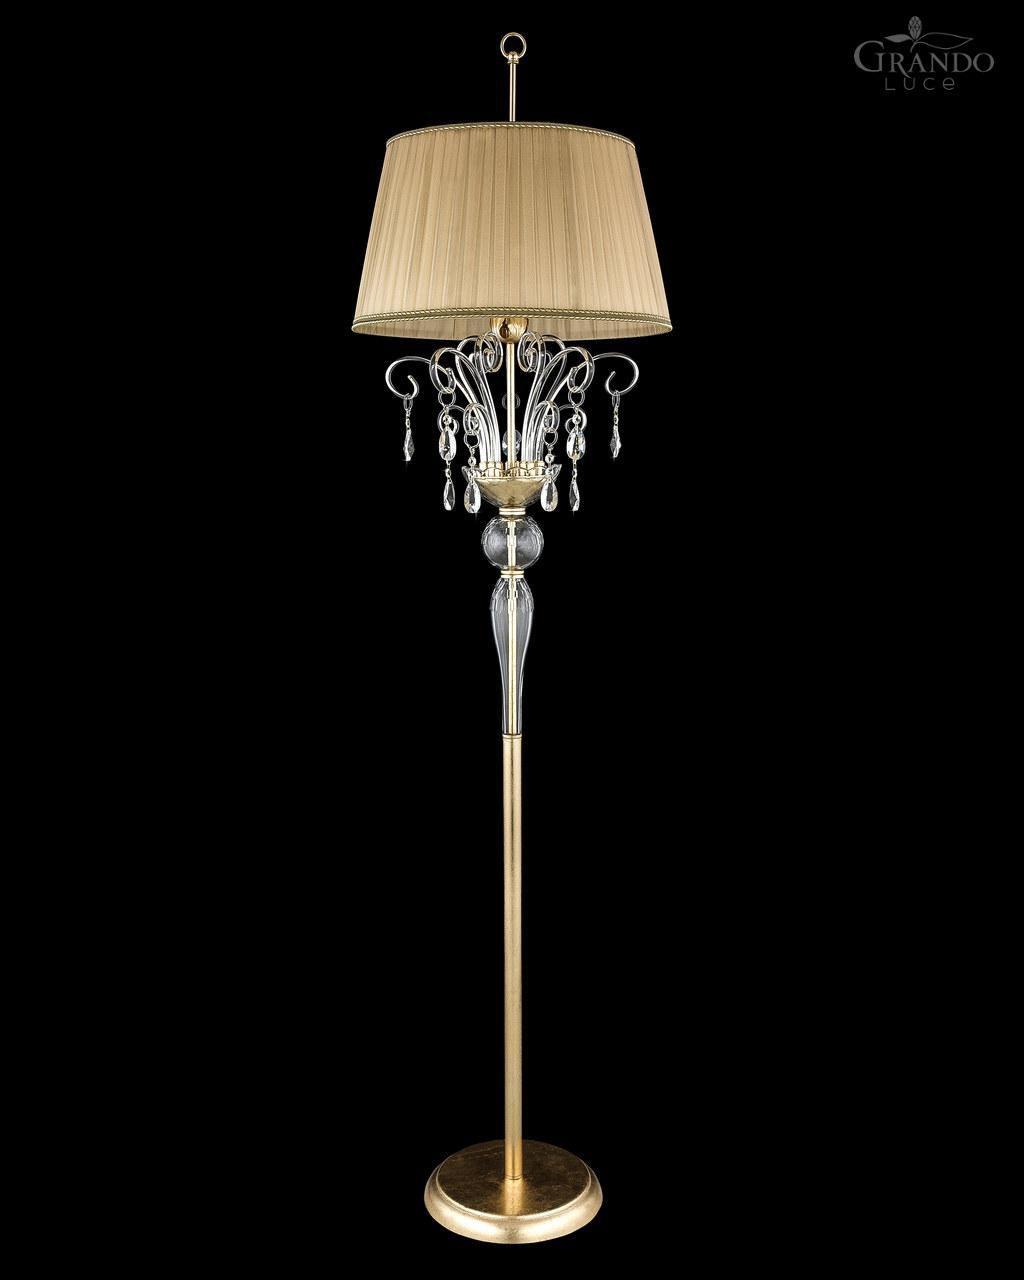 Floor Standing Lamp Contessa Grandoluce Traditional Metal Swarovski Crystal